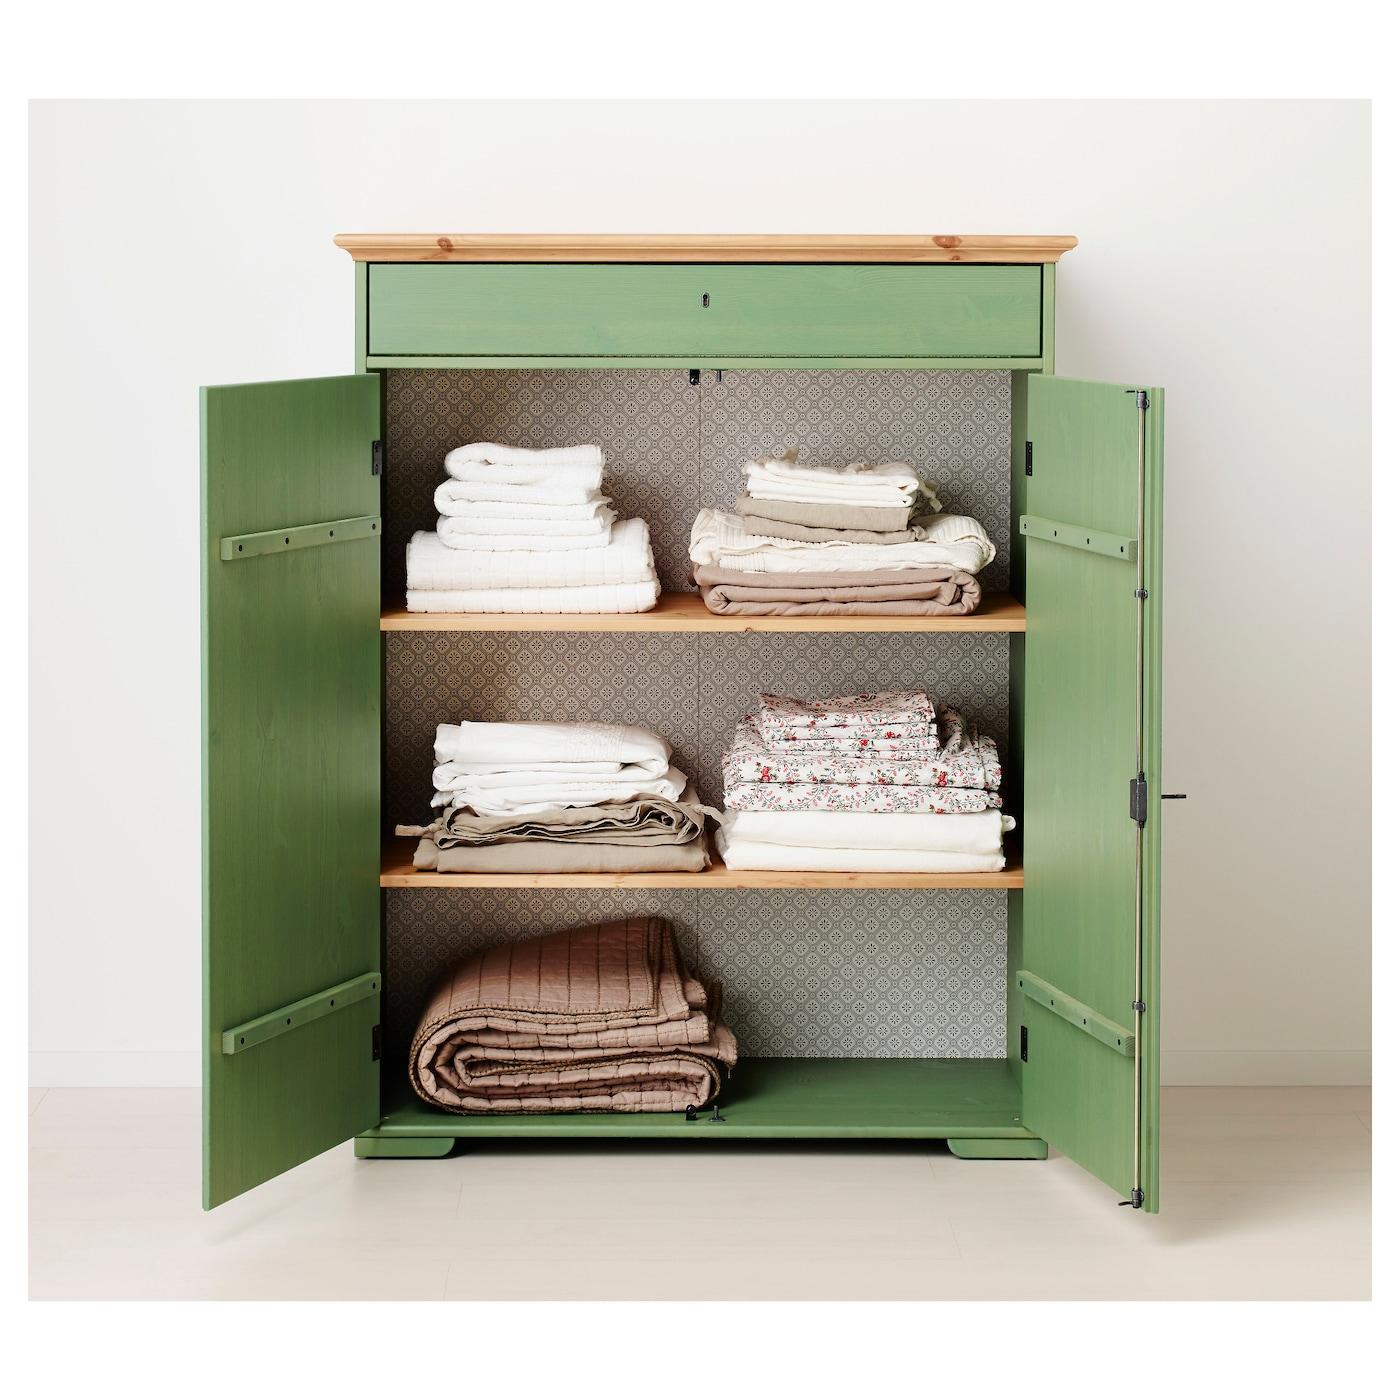 Hurdal Linen Cabinet Green 109 X 50 X 137 Cm Ikea